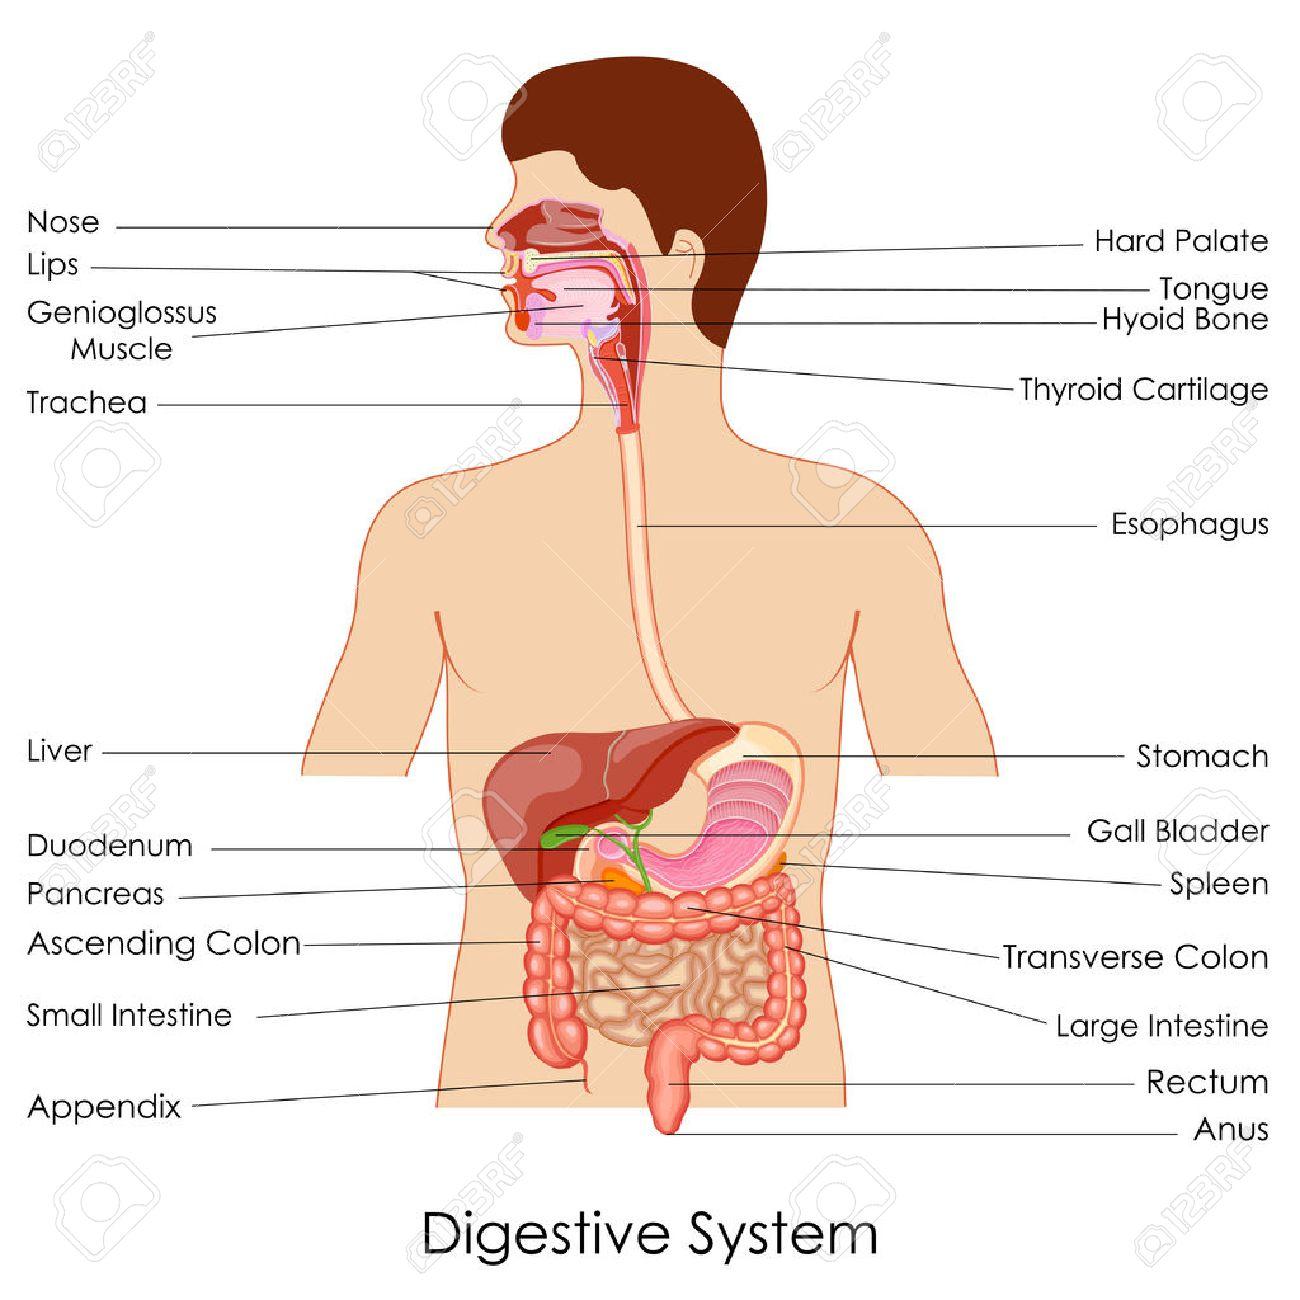 digestive system diagram   unmasa dalhadigestive system diagram